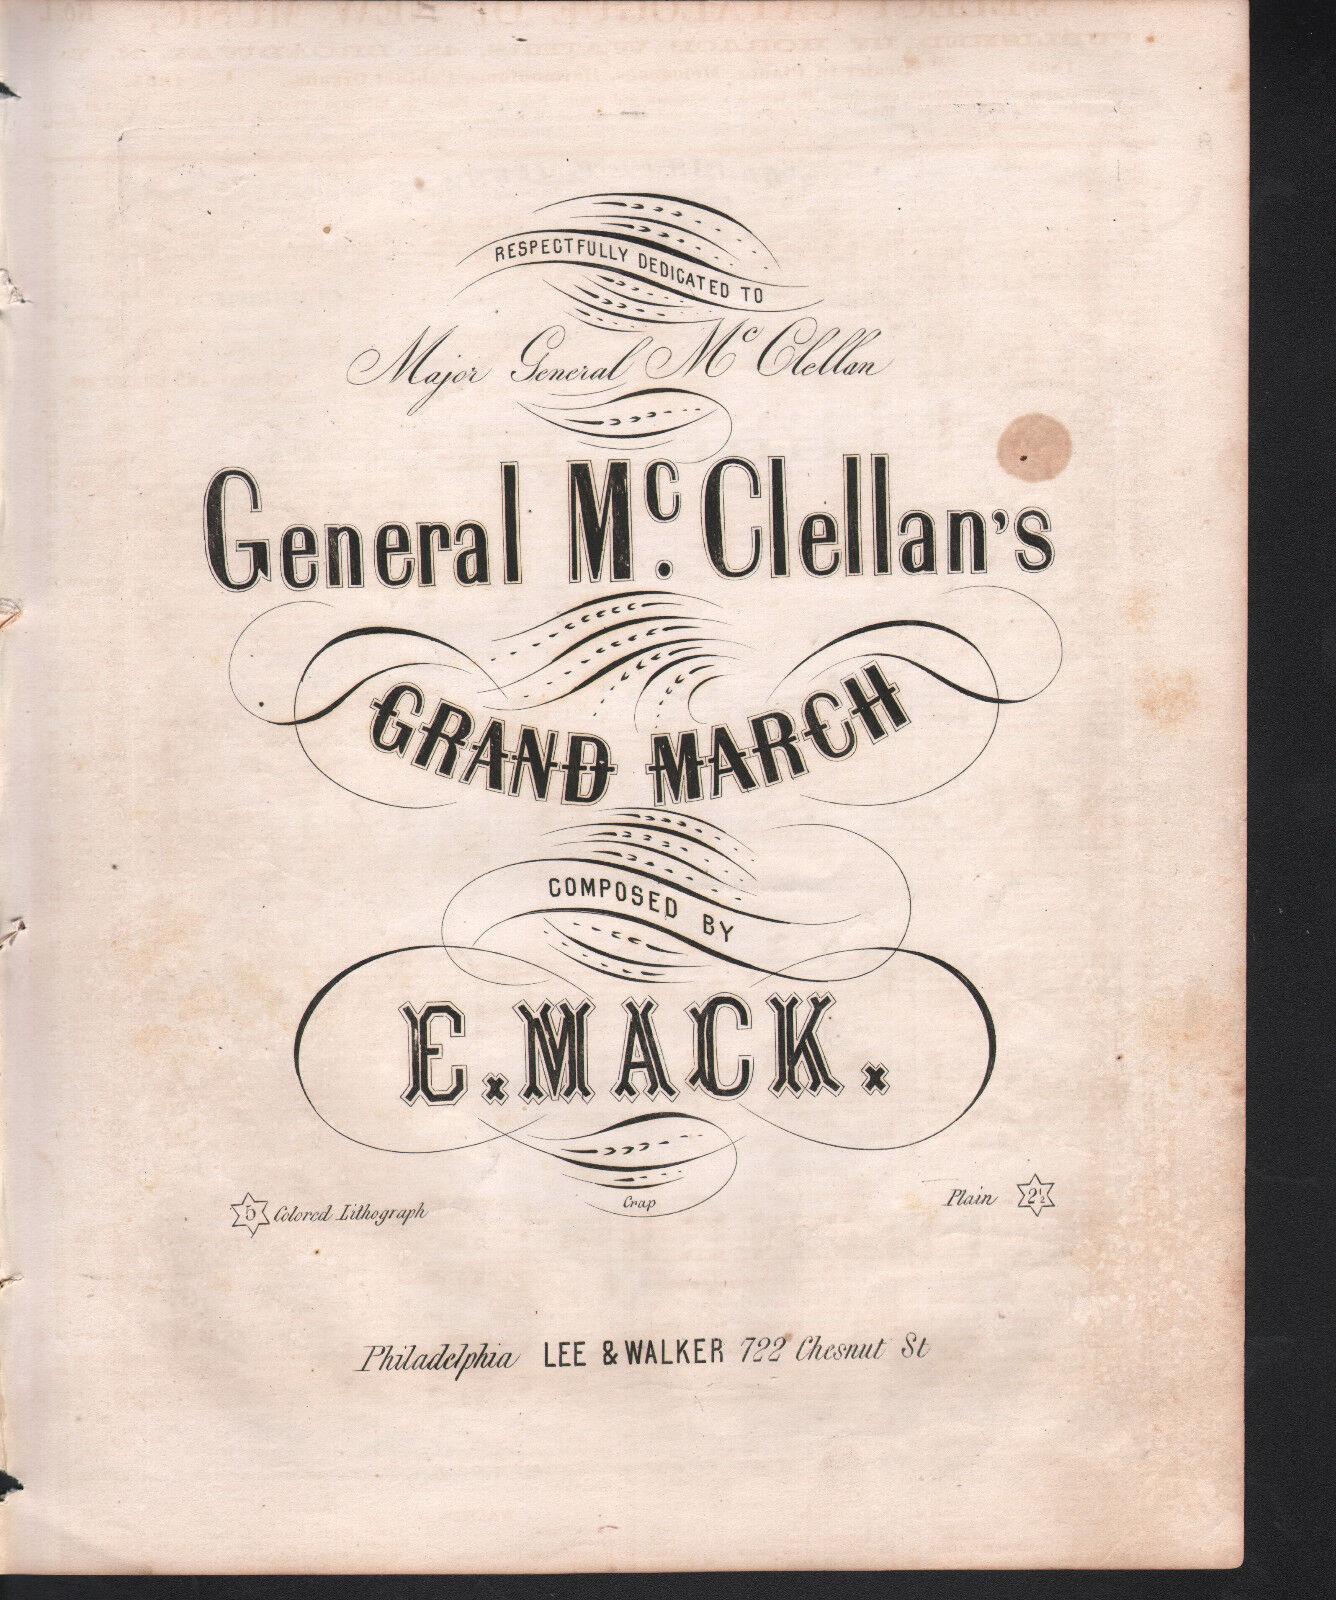 General McClellan's Grand March 1861 Sheet Music